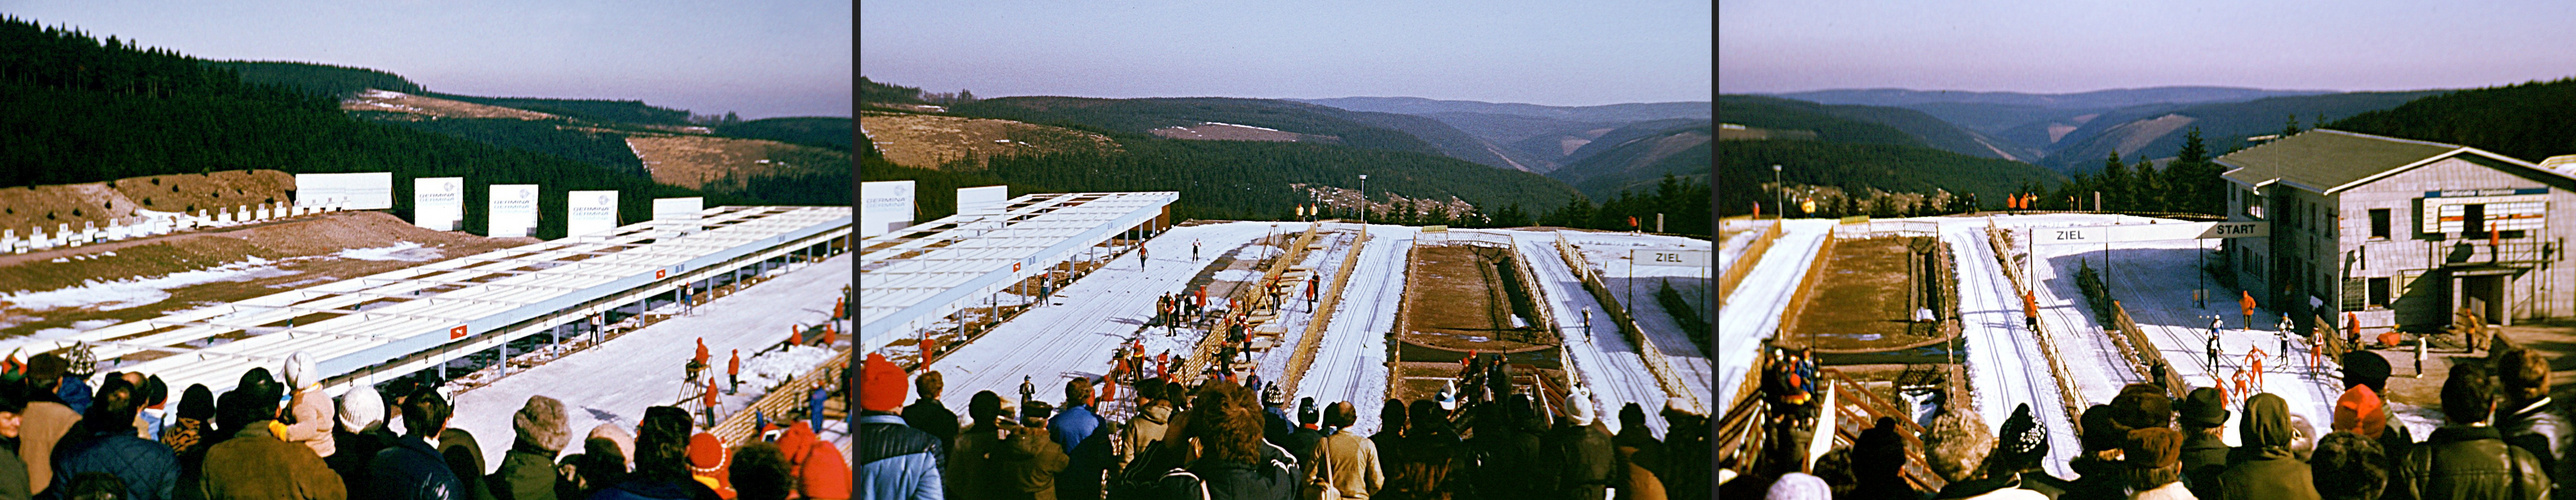 Biathlon Staffel Oberhof